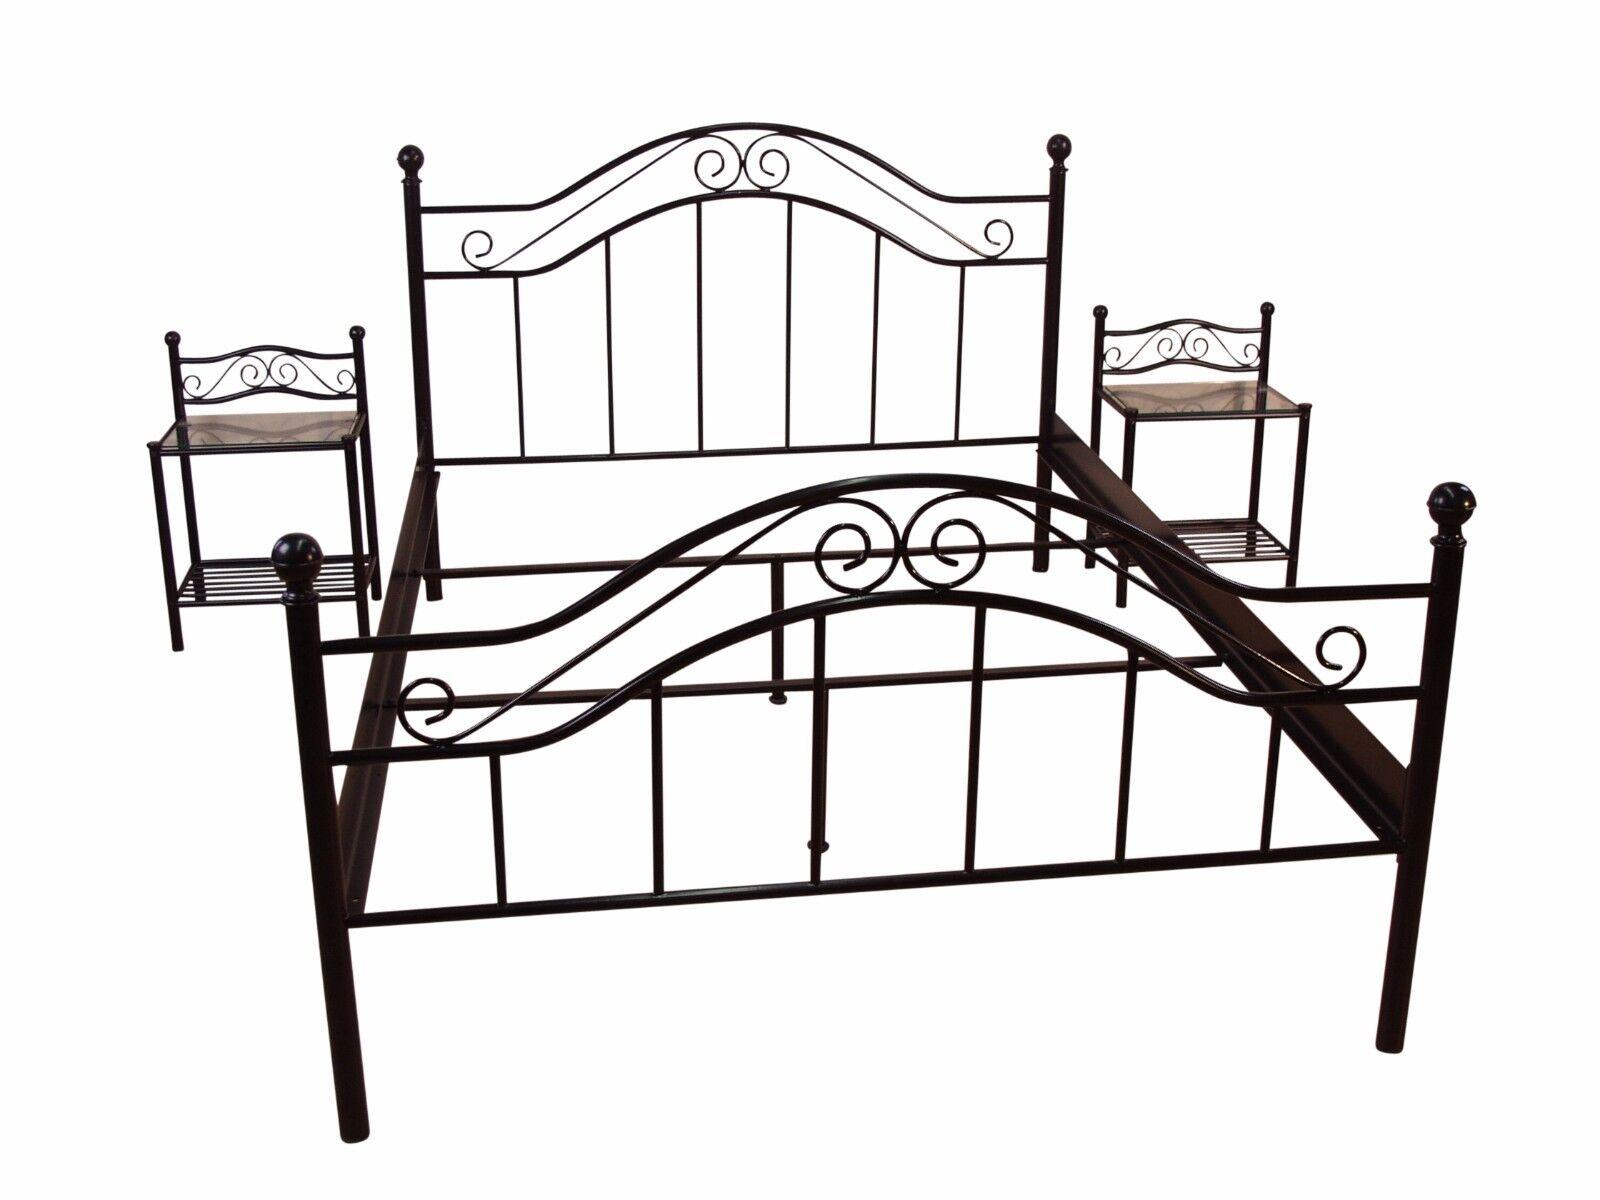 metallbett schwarz 90x200 aingoo bettgestell 90x200 metallbett bettrahmen mit lattenrost f r. Black Bedroom Furniture Sets. Home Design Ideas